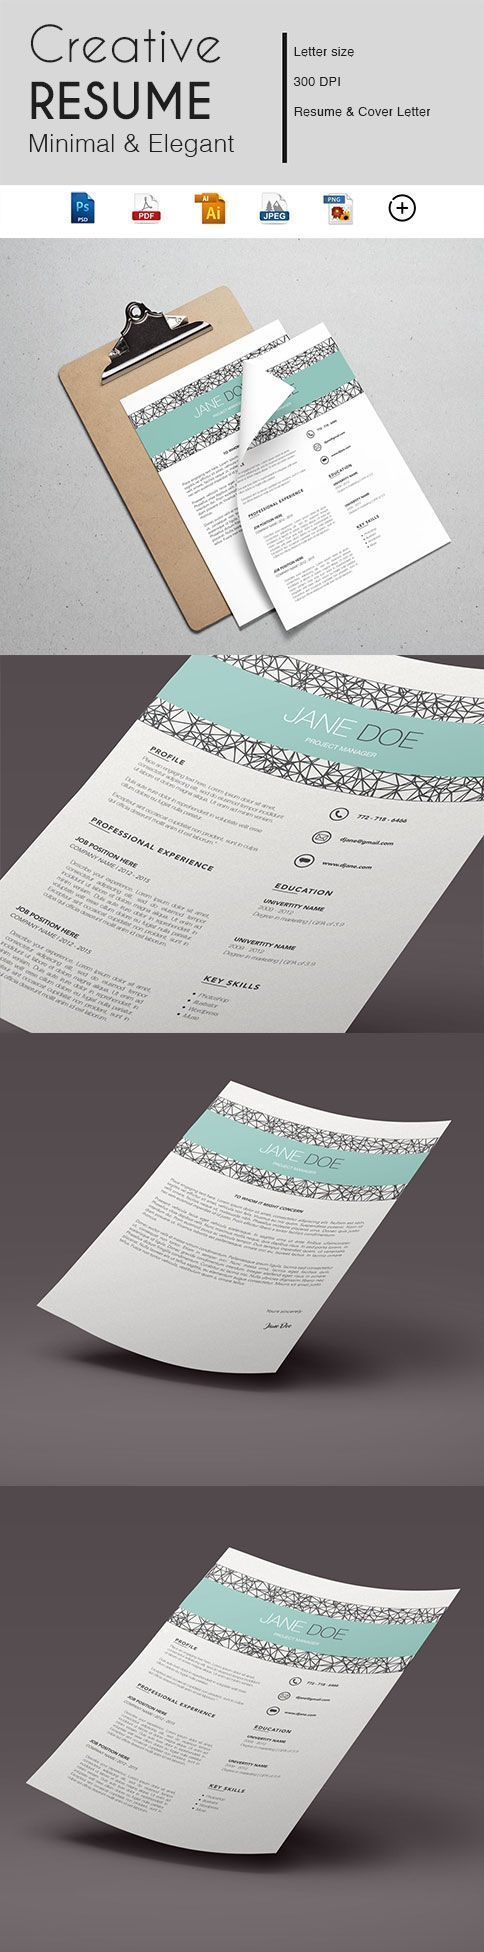 Best 25 Make A Resume Ideas On Pinterest Resume Resume